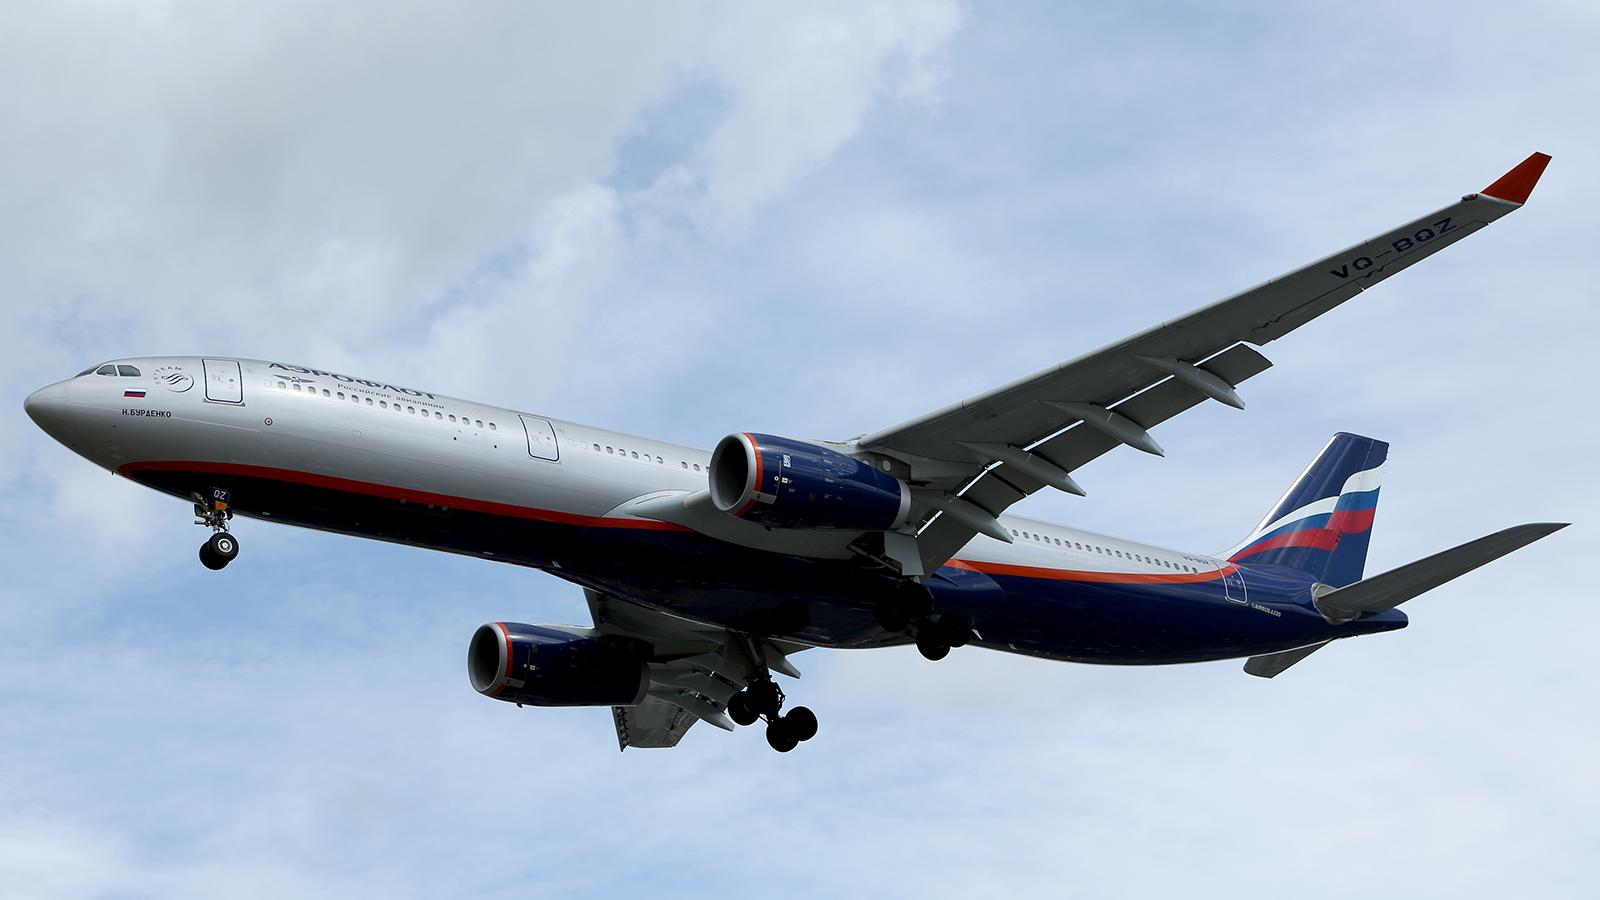 Aeroflot - Russian Airlines (VQ-BQZ)